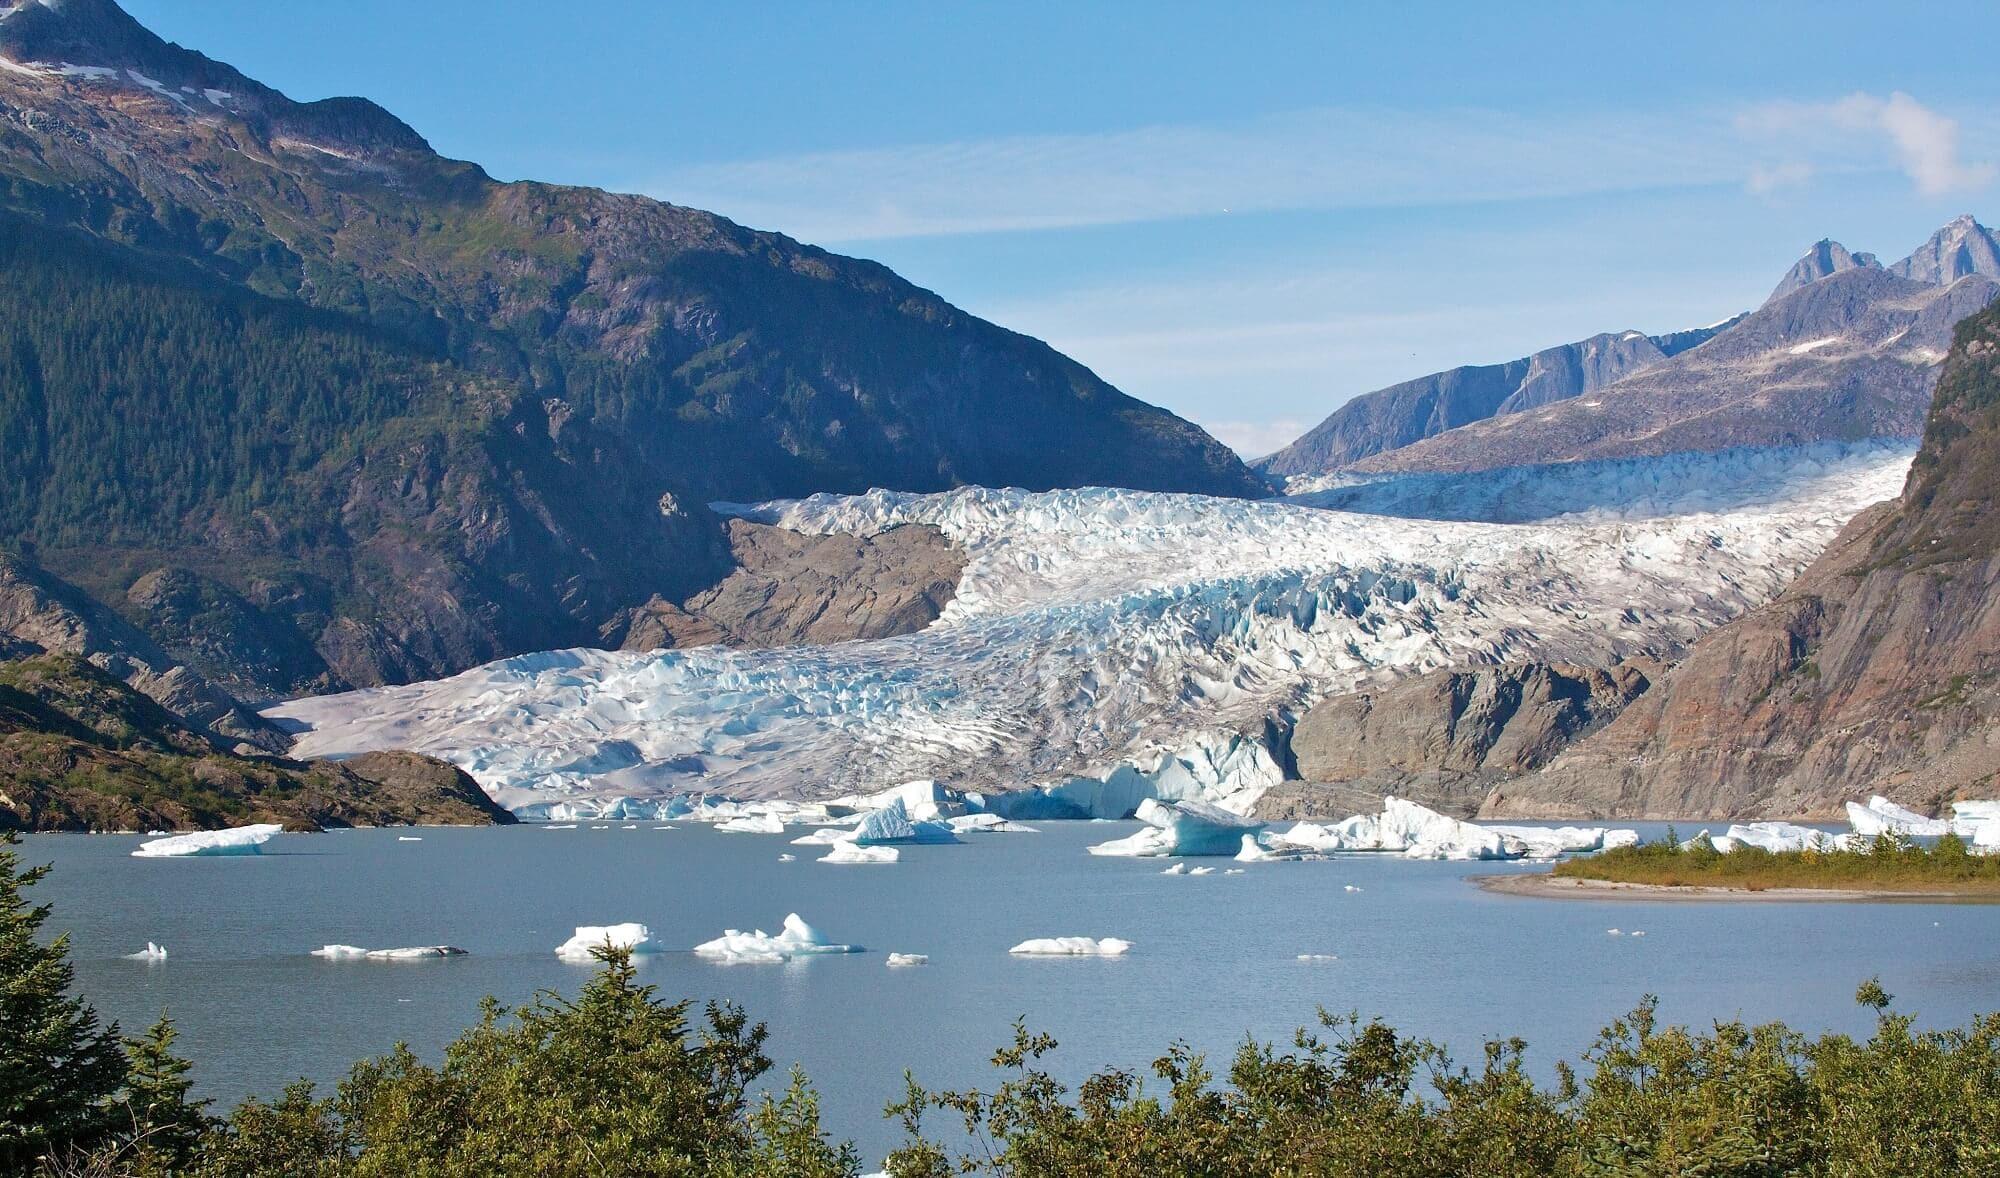 https://www.kawanti.com/wp-content/uploads/2018/10/Juneau-Zip-Mendenhall-Glacier.jpg